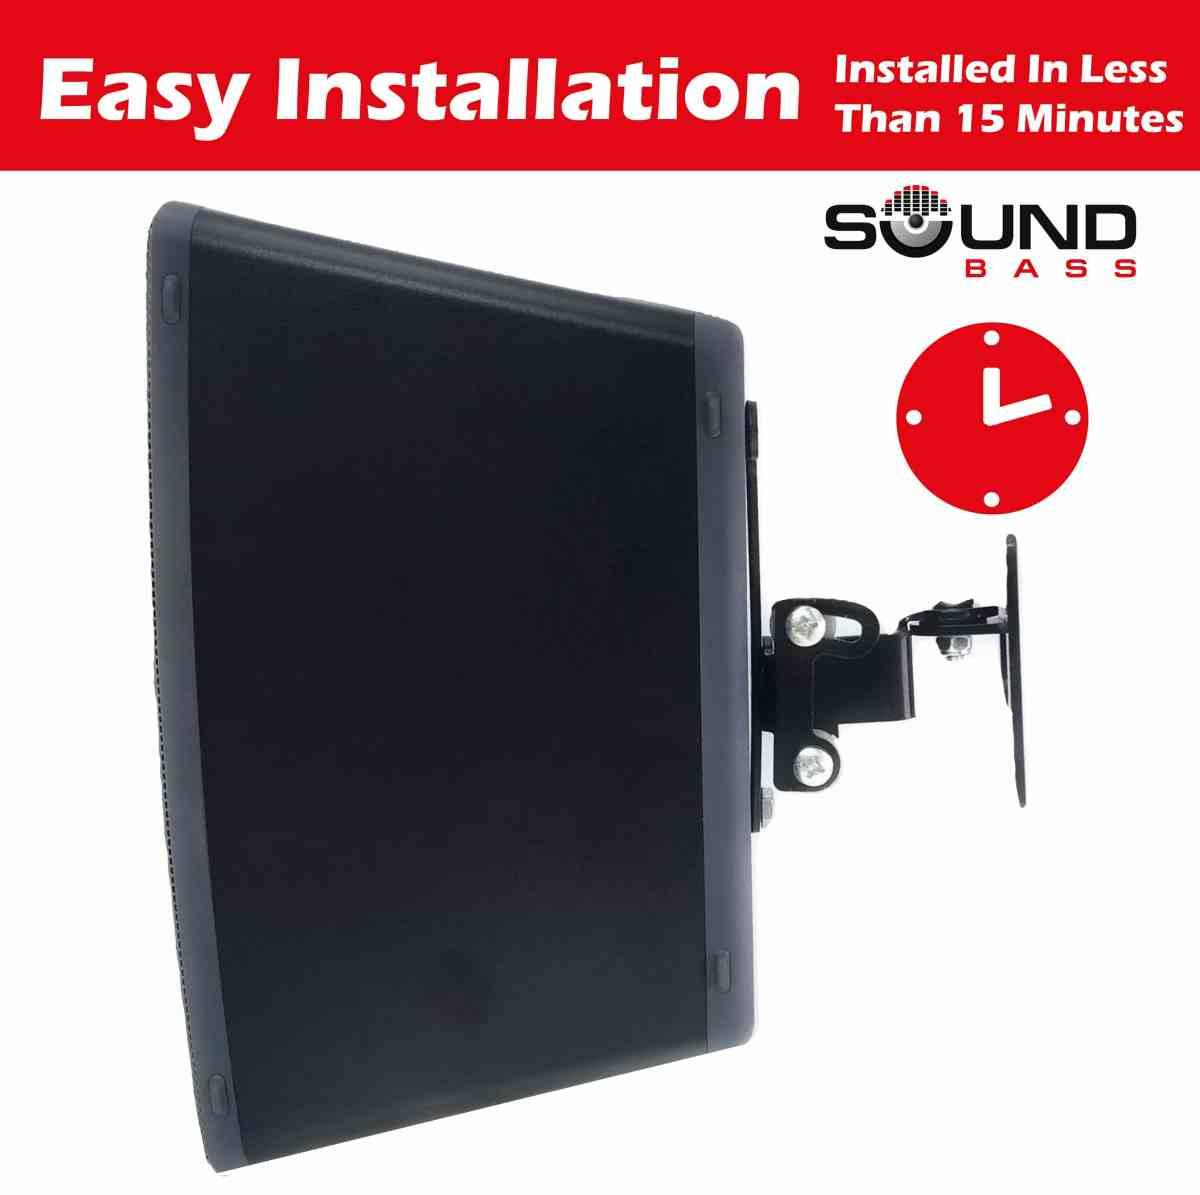 SOUNDBASS-SONOS-PLAY3-WALL-MOUNT-BRACKET